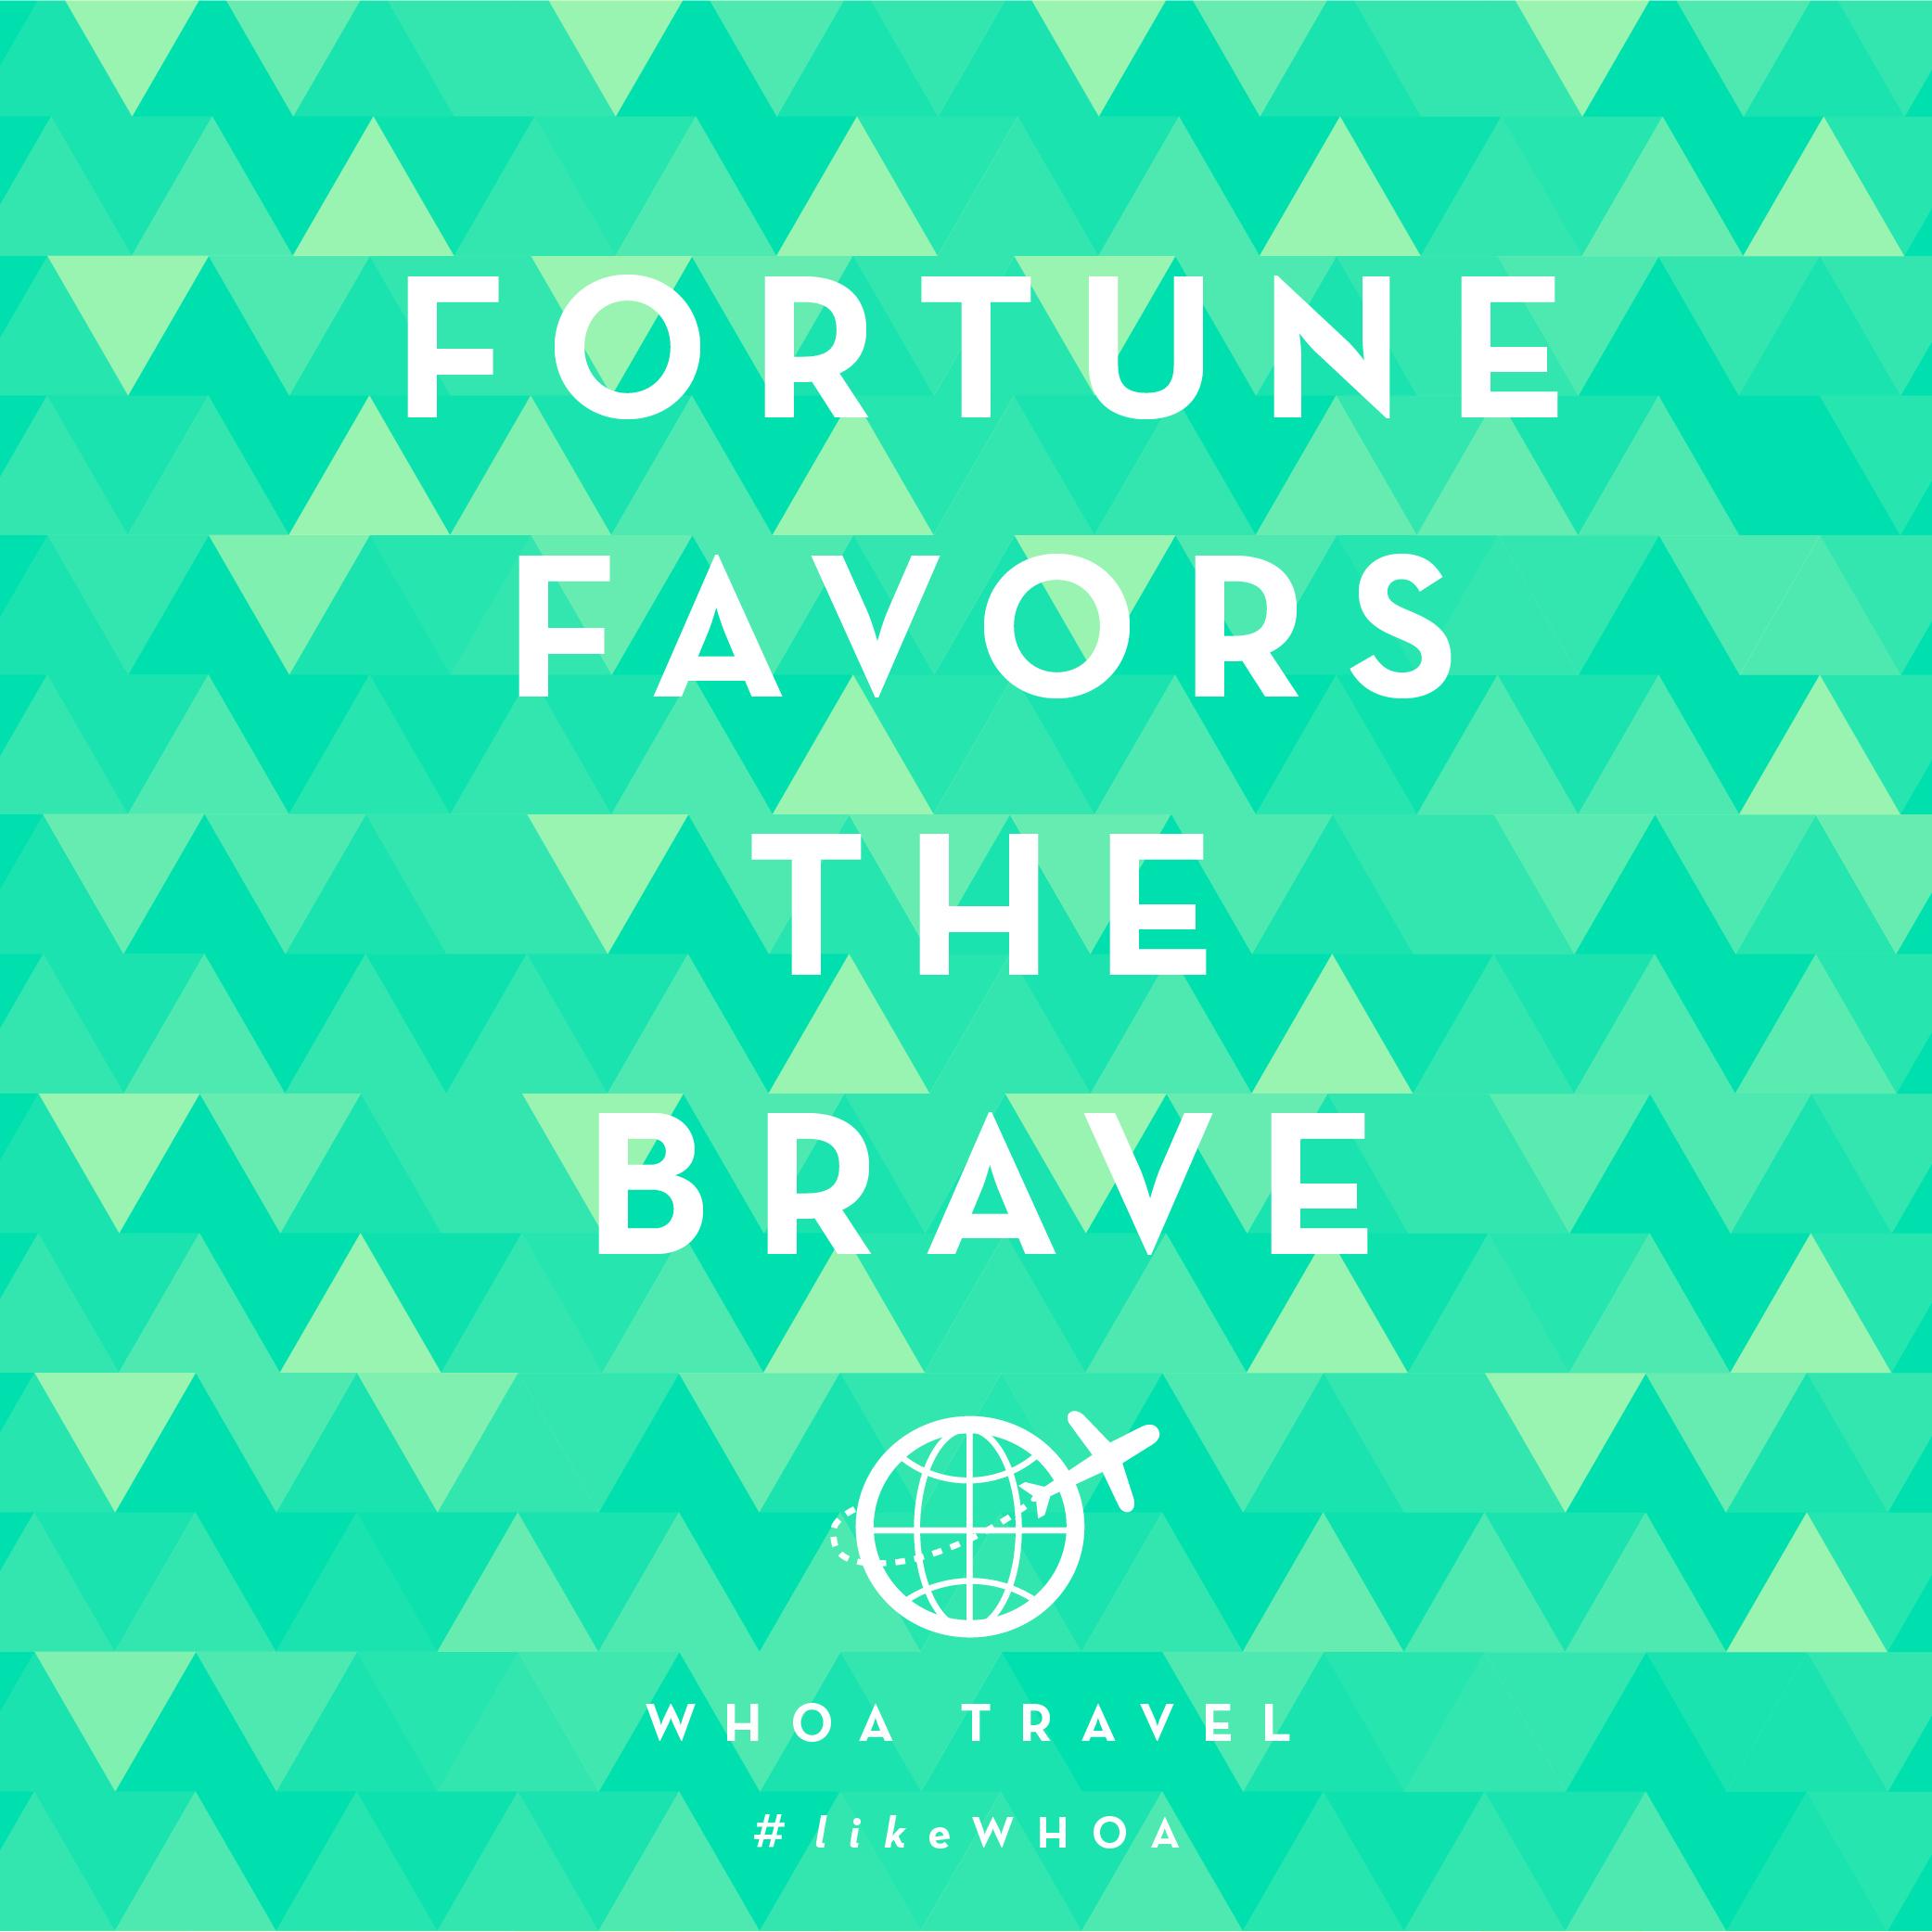 WHOA travel inspiration ADVENSPIRATION brave